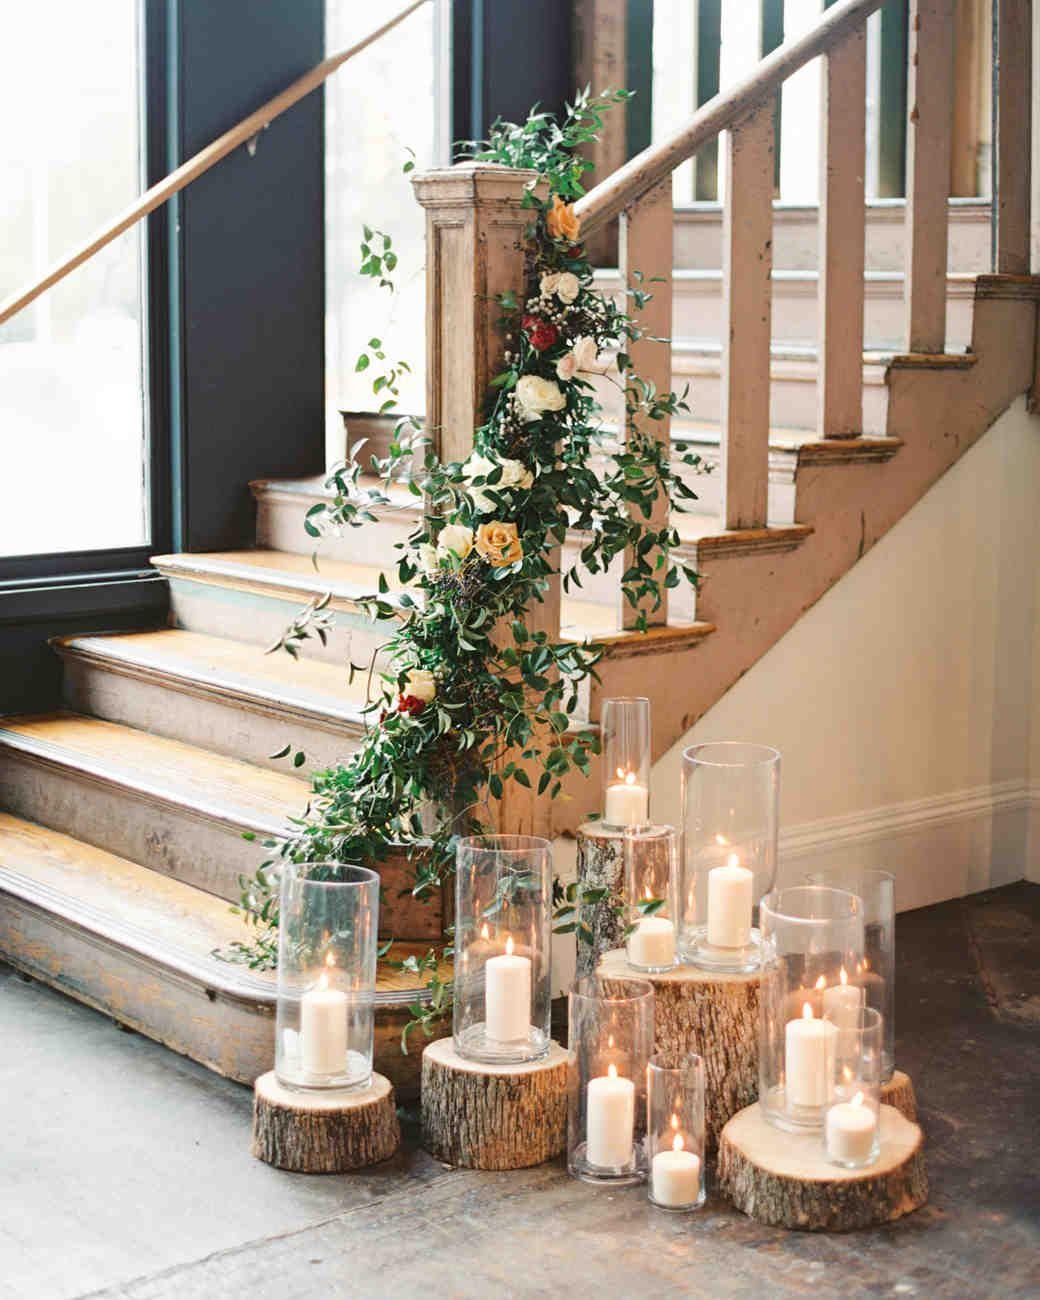 Pinehurst North Carolina Rustic Barn Wedding: A Romantic, Rustic Wedding In Columbia, South Carolina